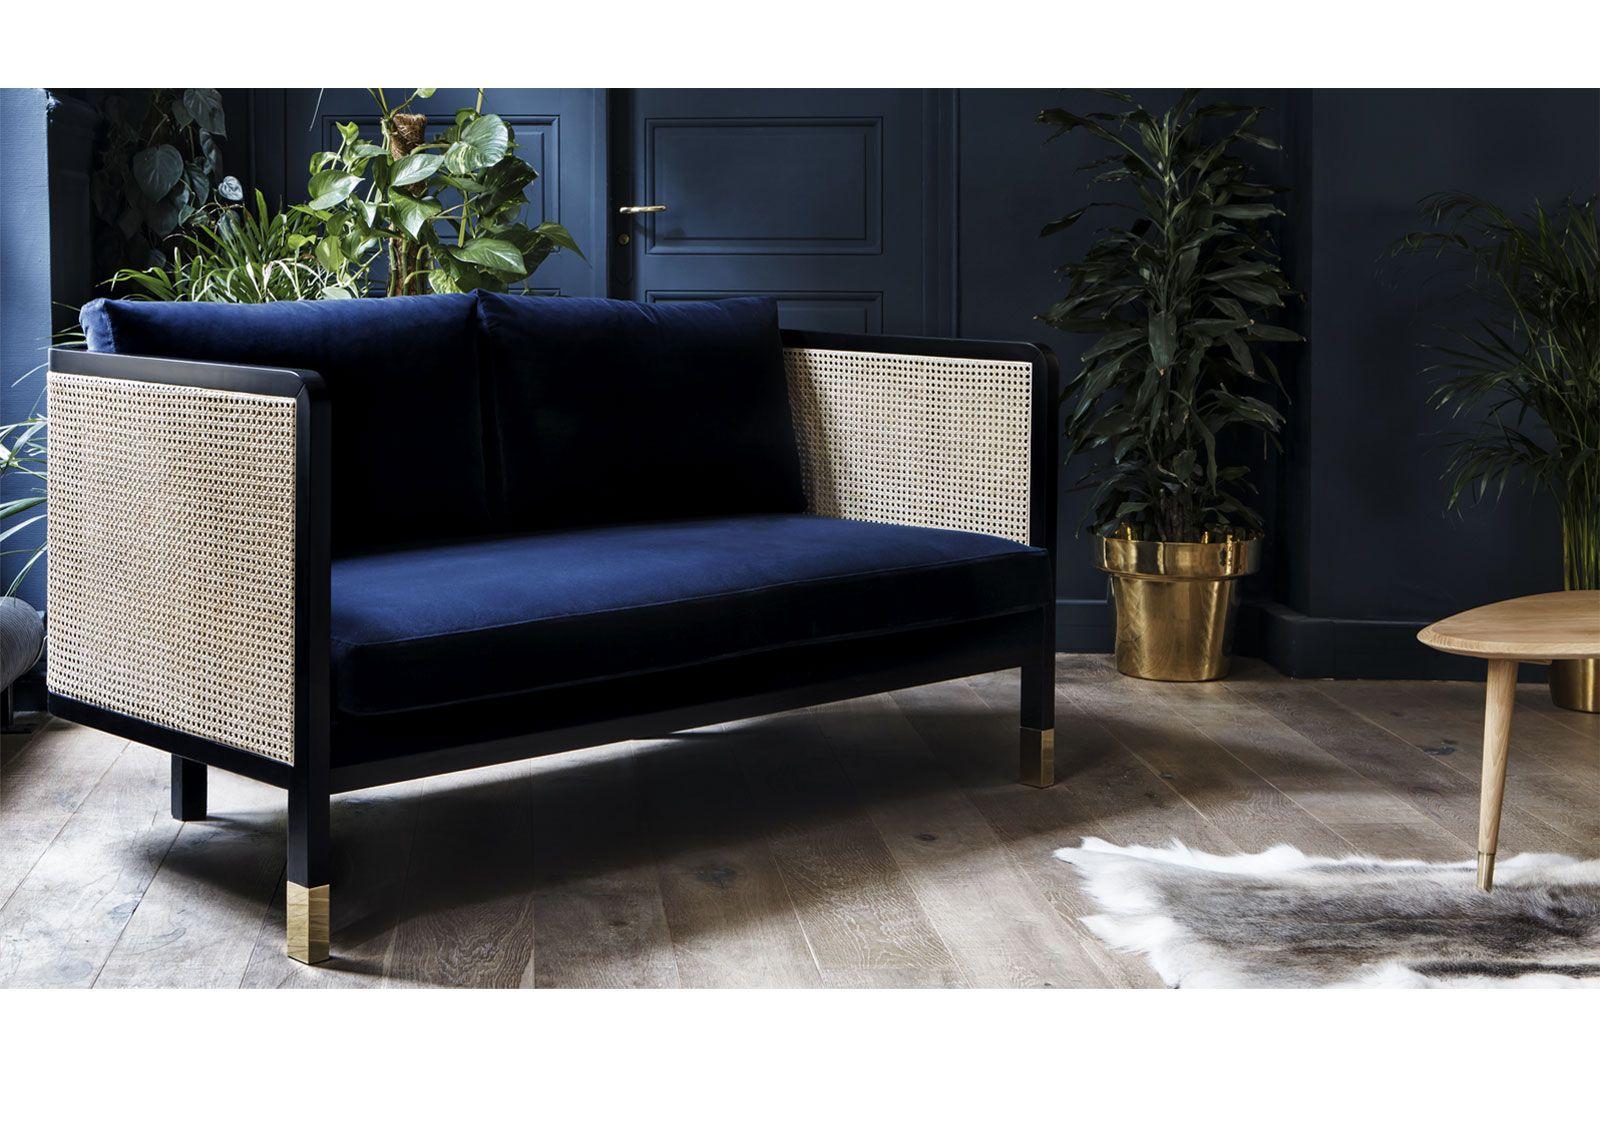 Canapé red edition, tissu velours, meuble design, mobilier design ...